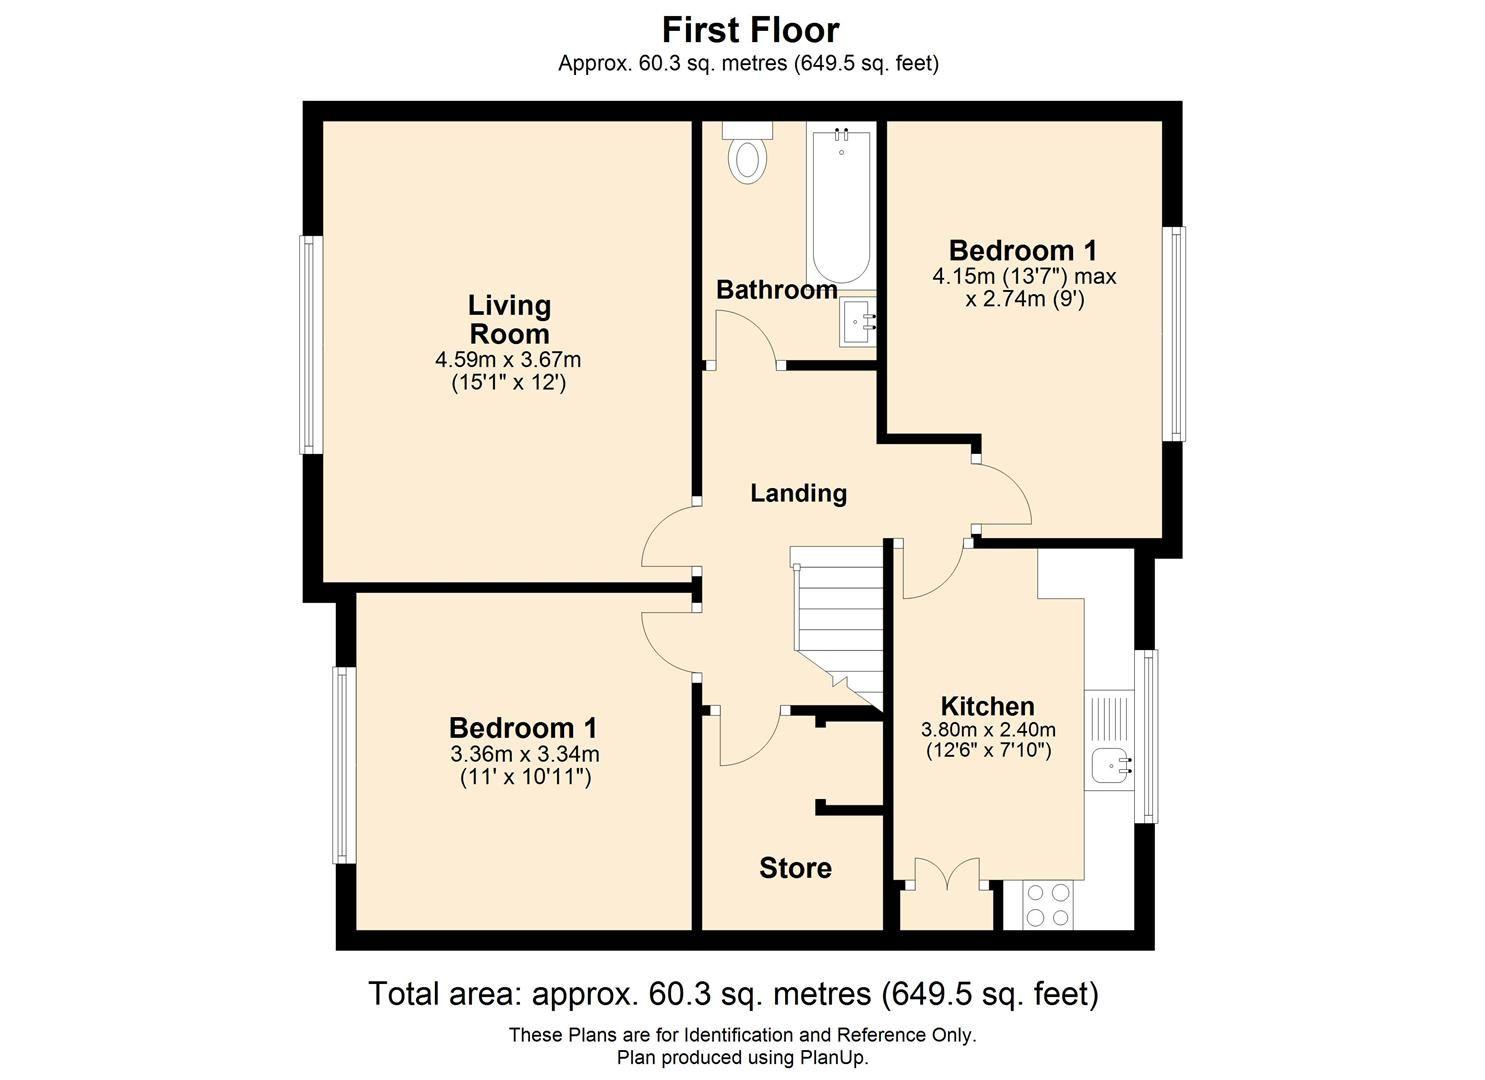 2 bed maisonette for sale - Property Floorplan